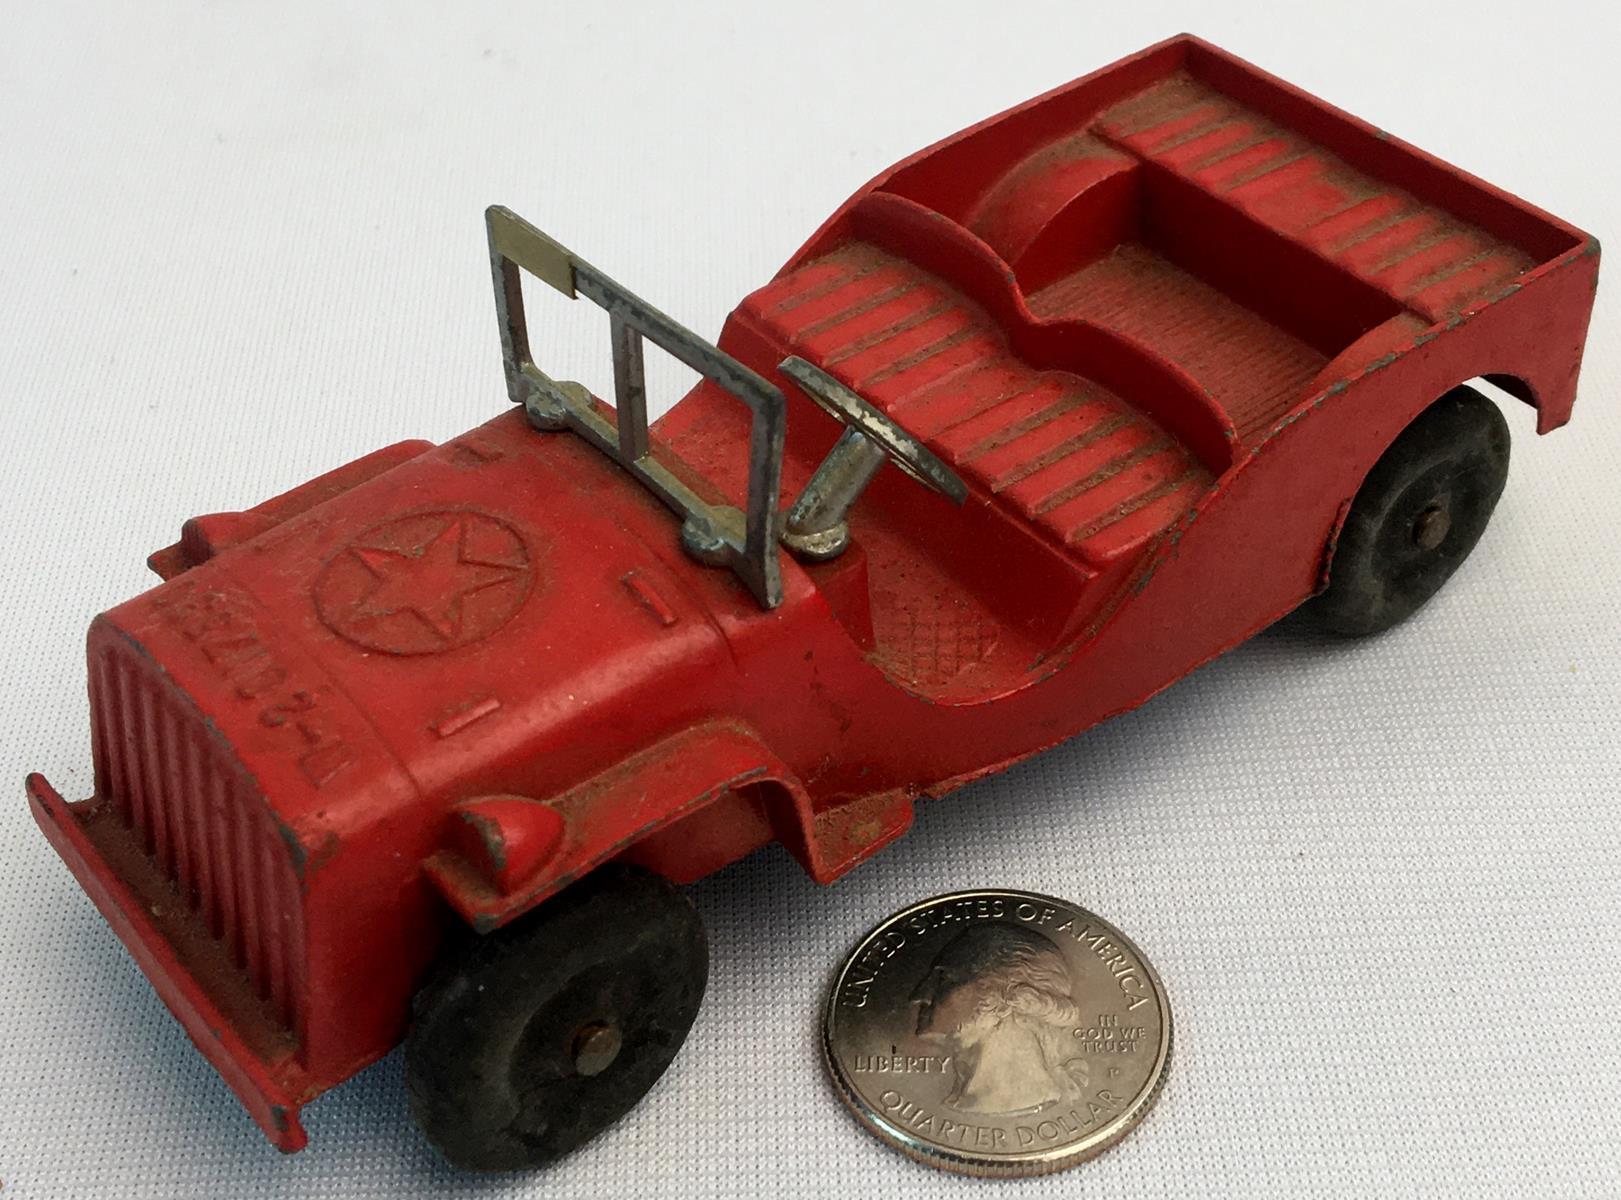 Vintage 1950's Tootsietoy Die-Cast Red Army Jeep W-2017590